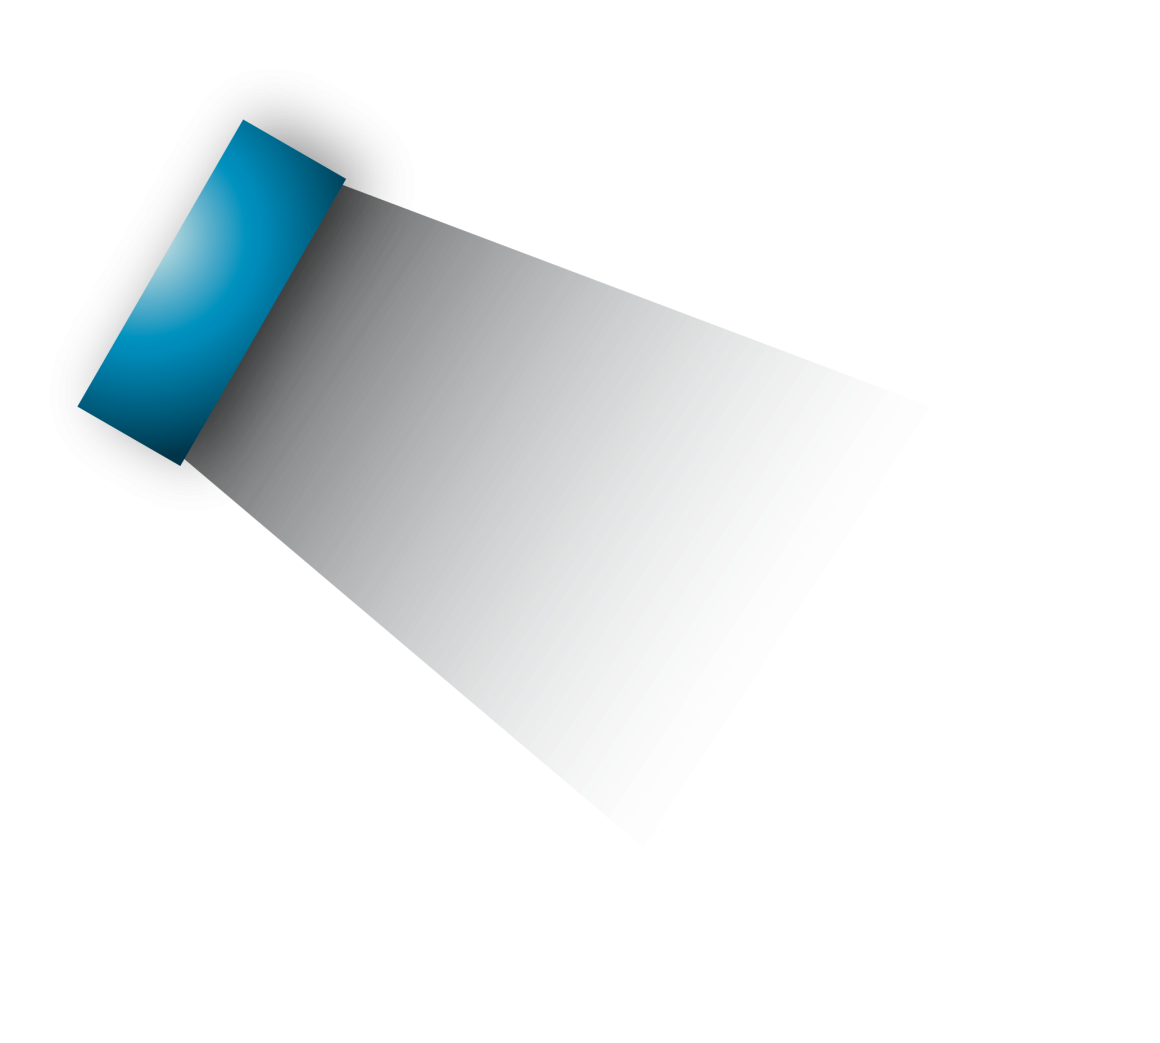 illustration of a road block